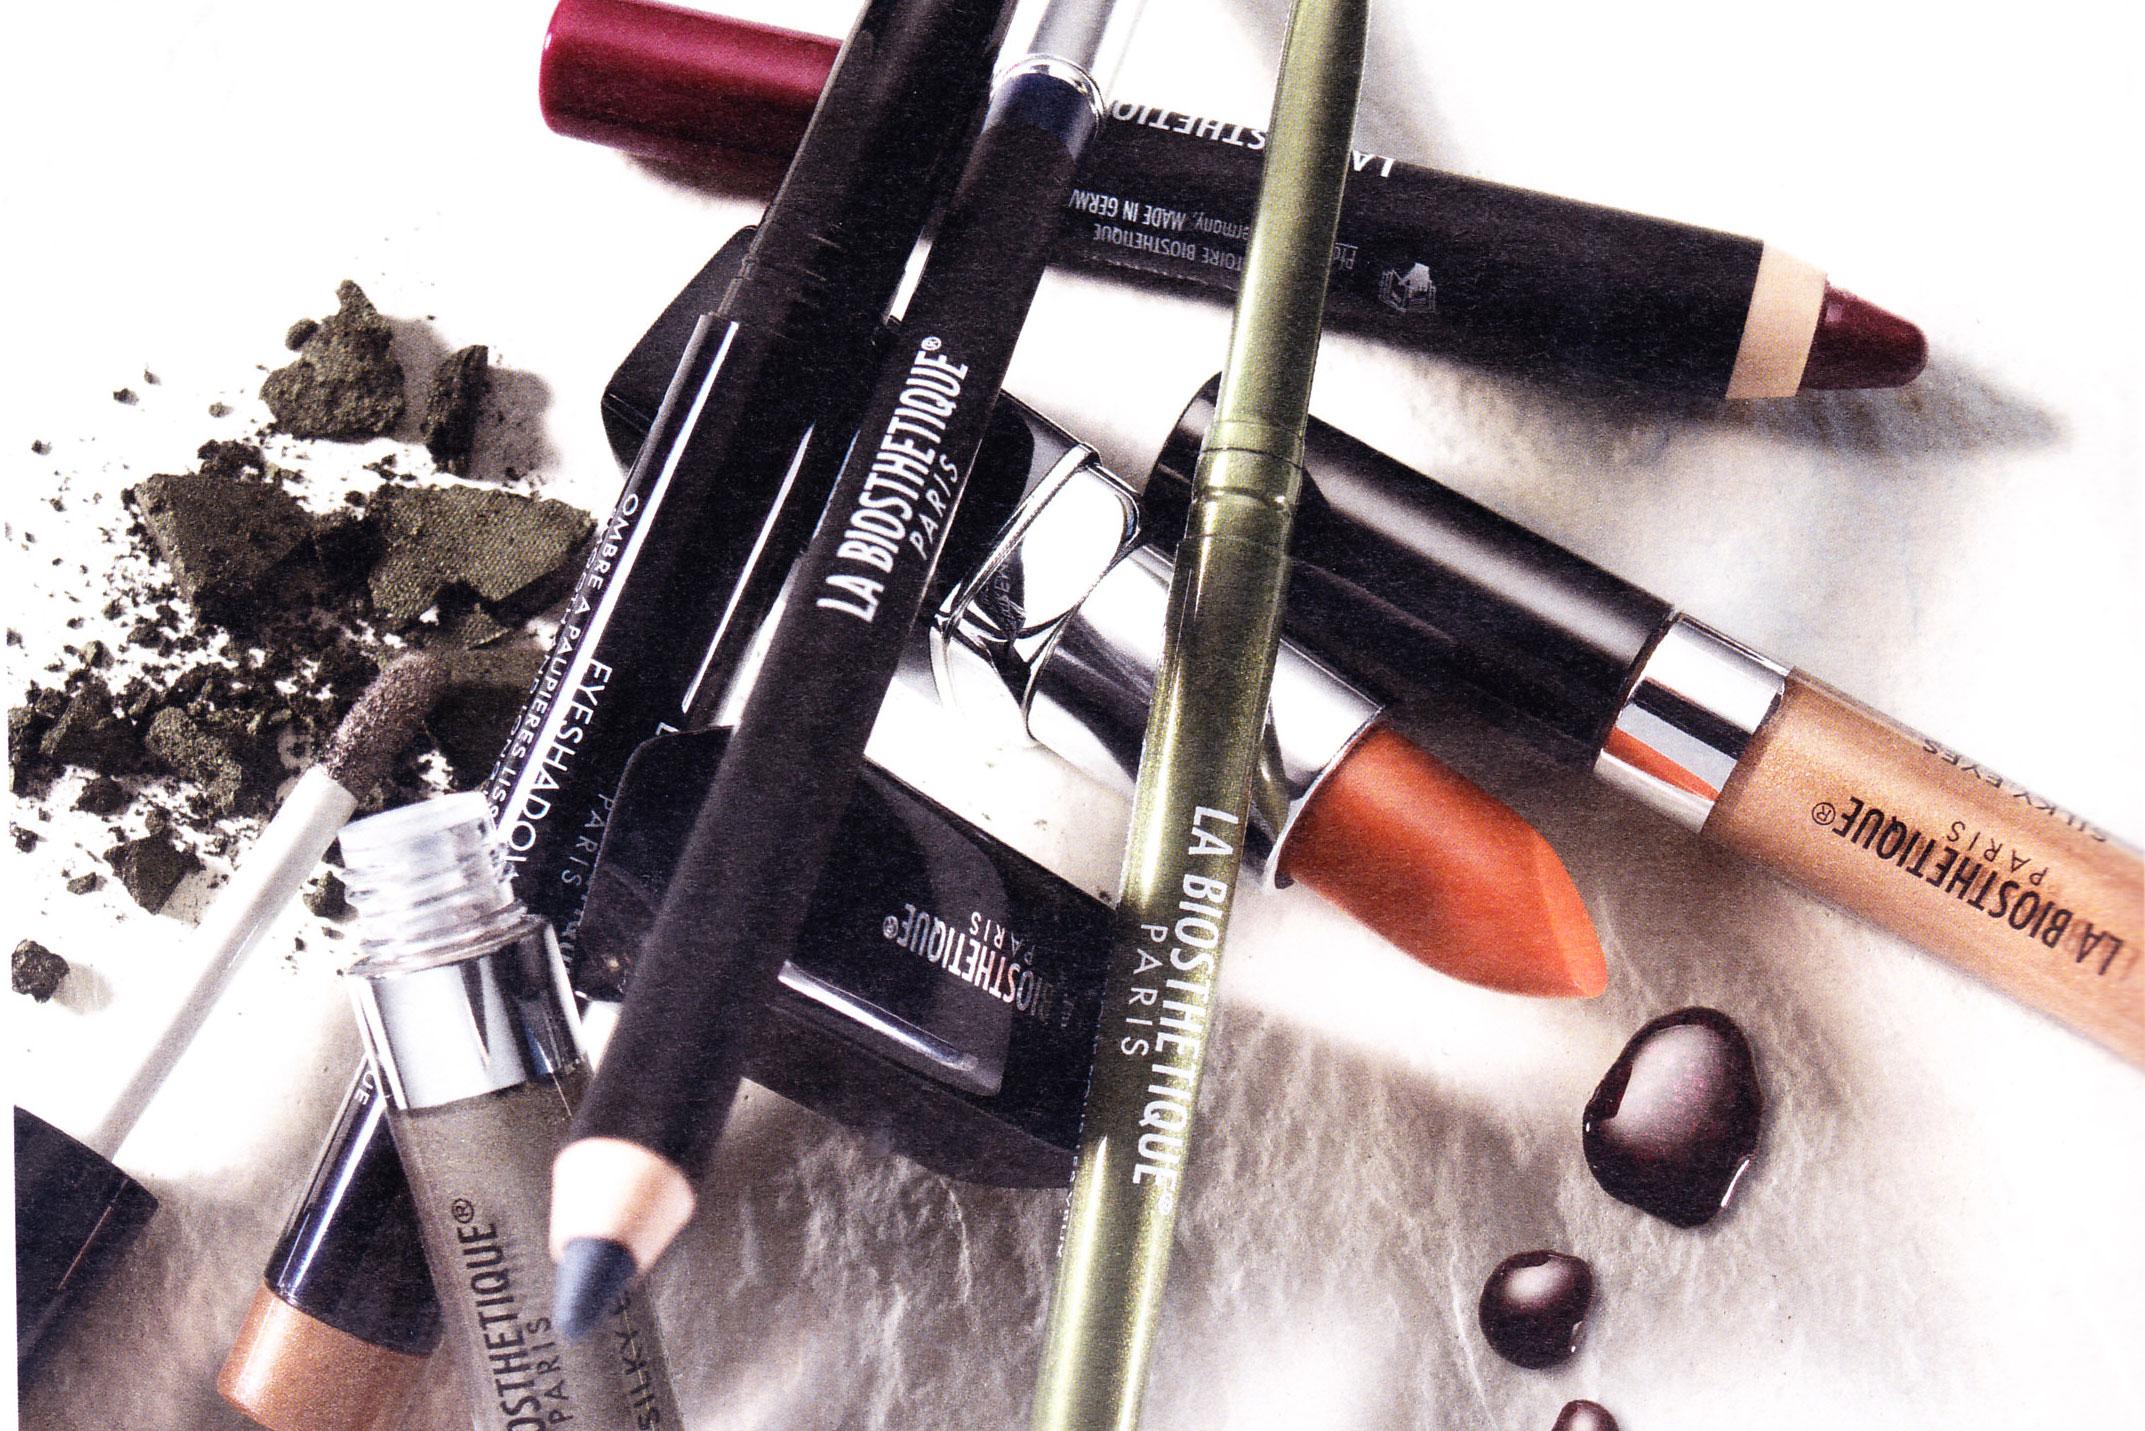 Lip Color Stift von La Biosthétique bei Coiffure Vogue in Aarau